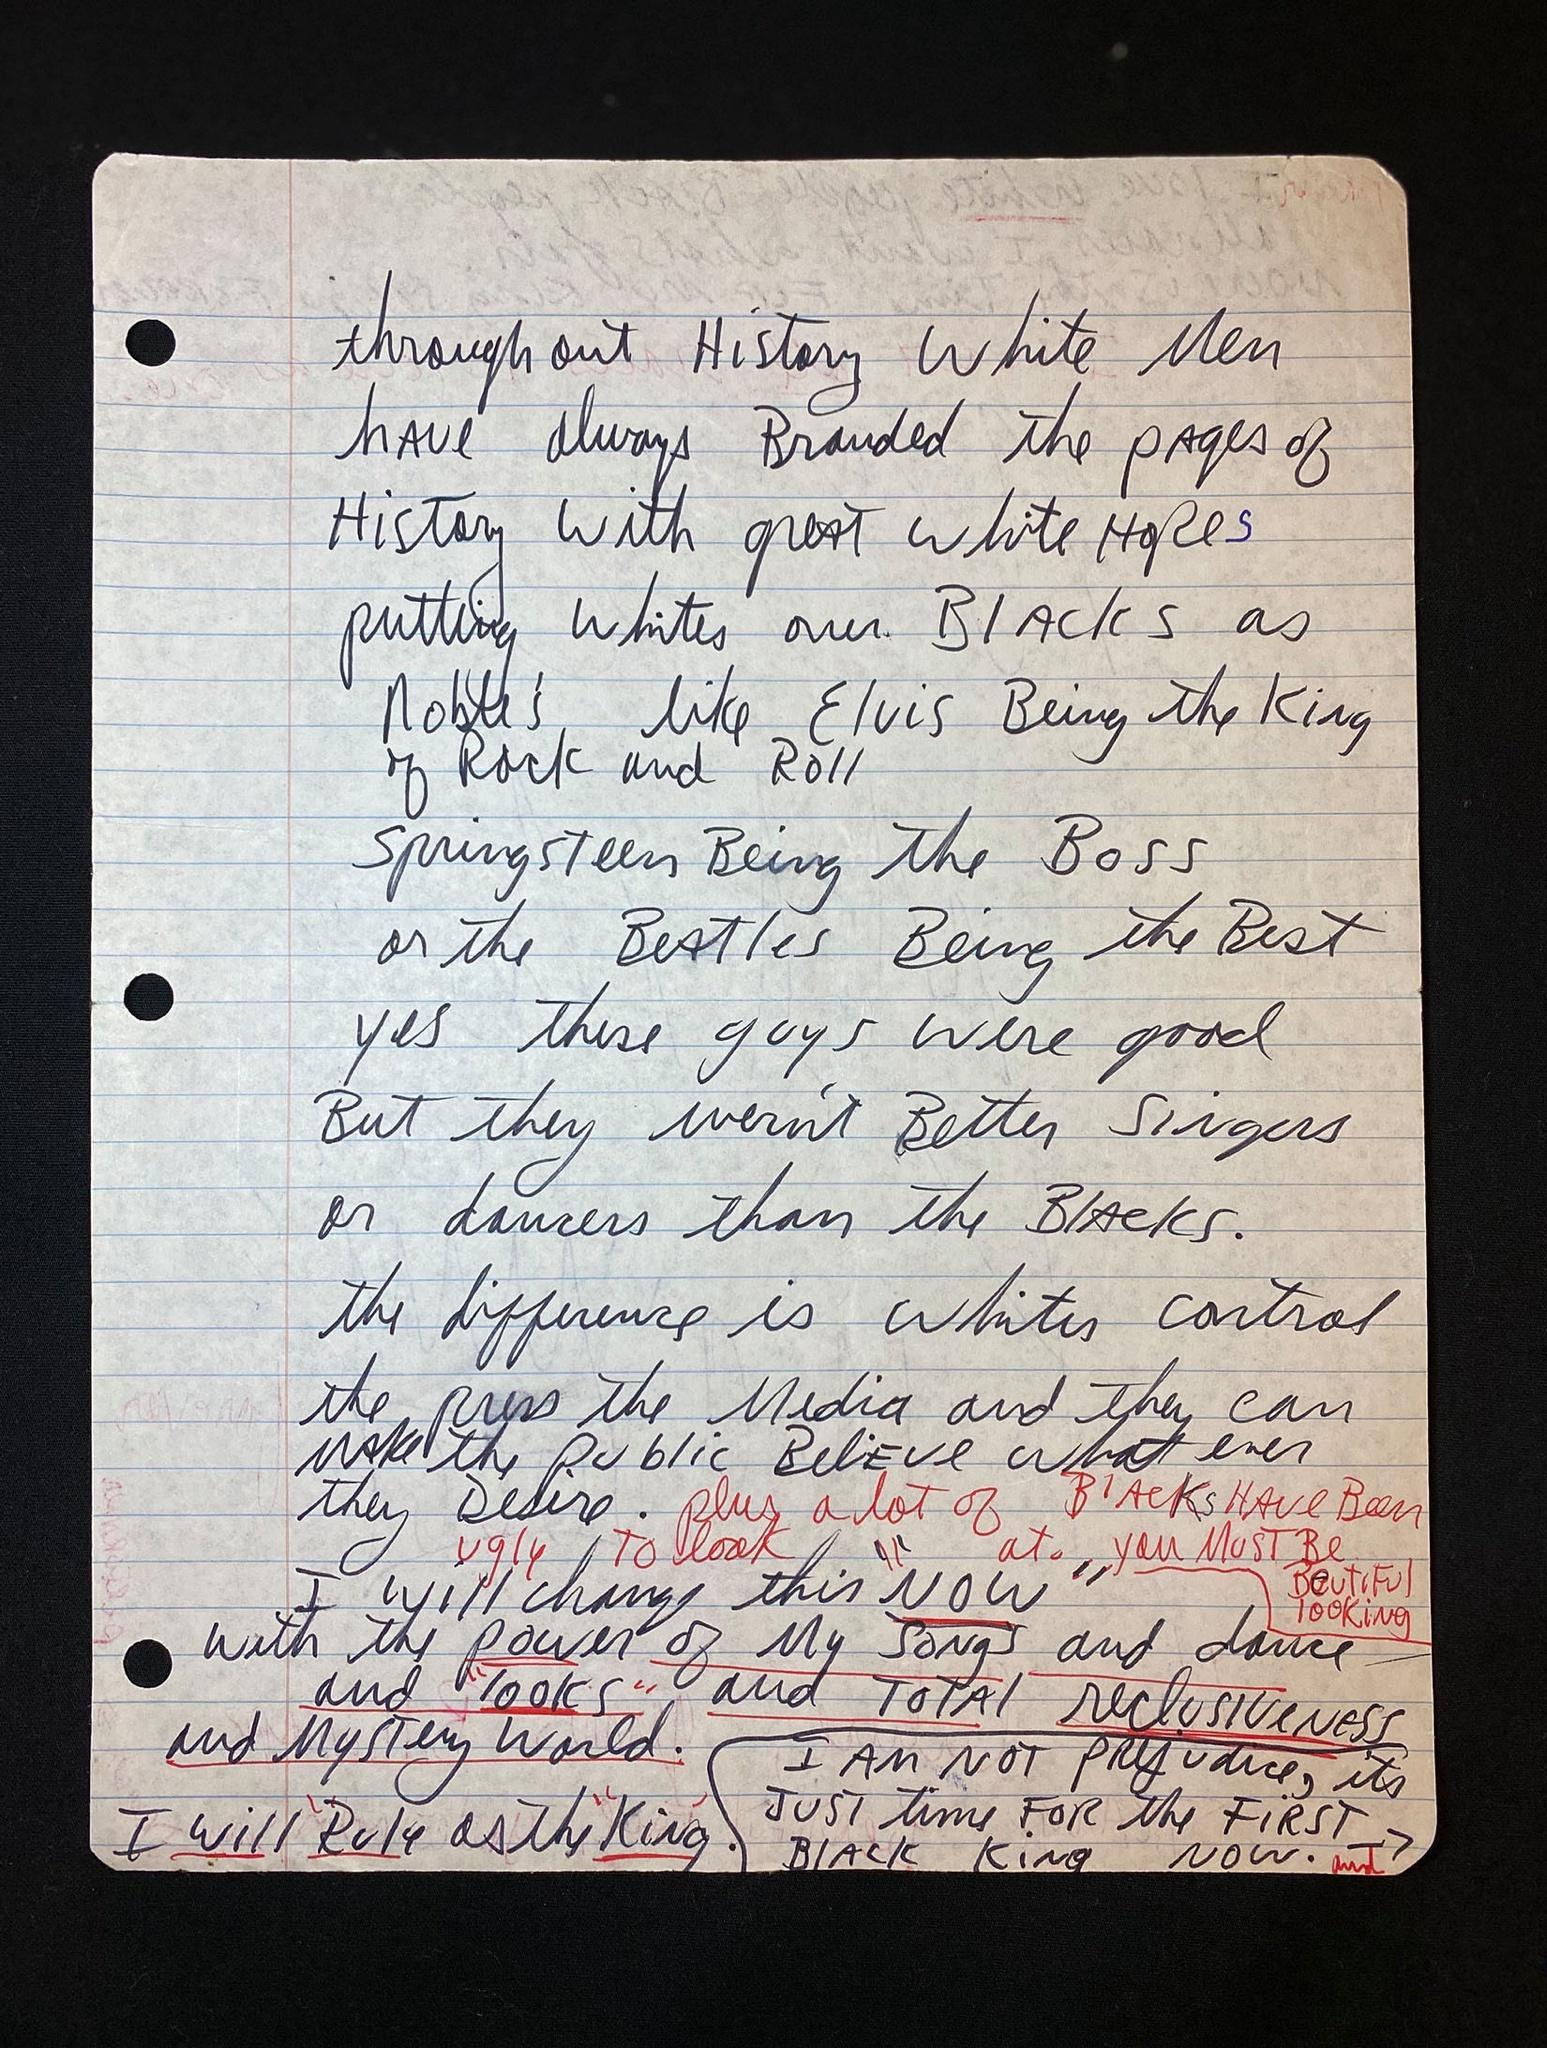 Michael Jackson Manifest 1987 I will rule asthe King